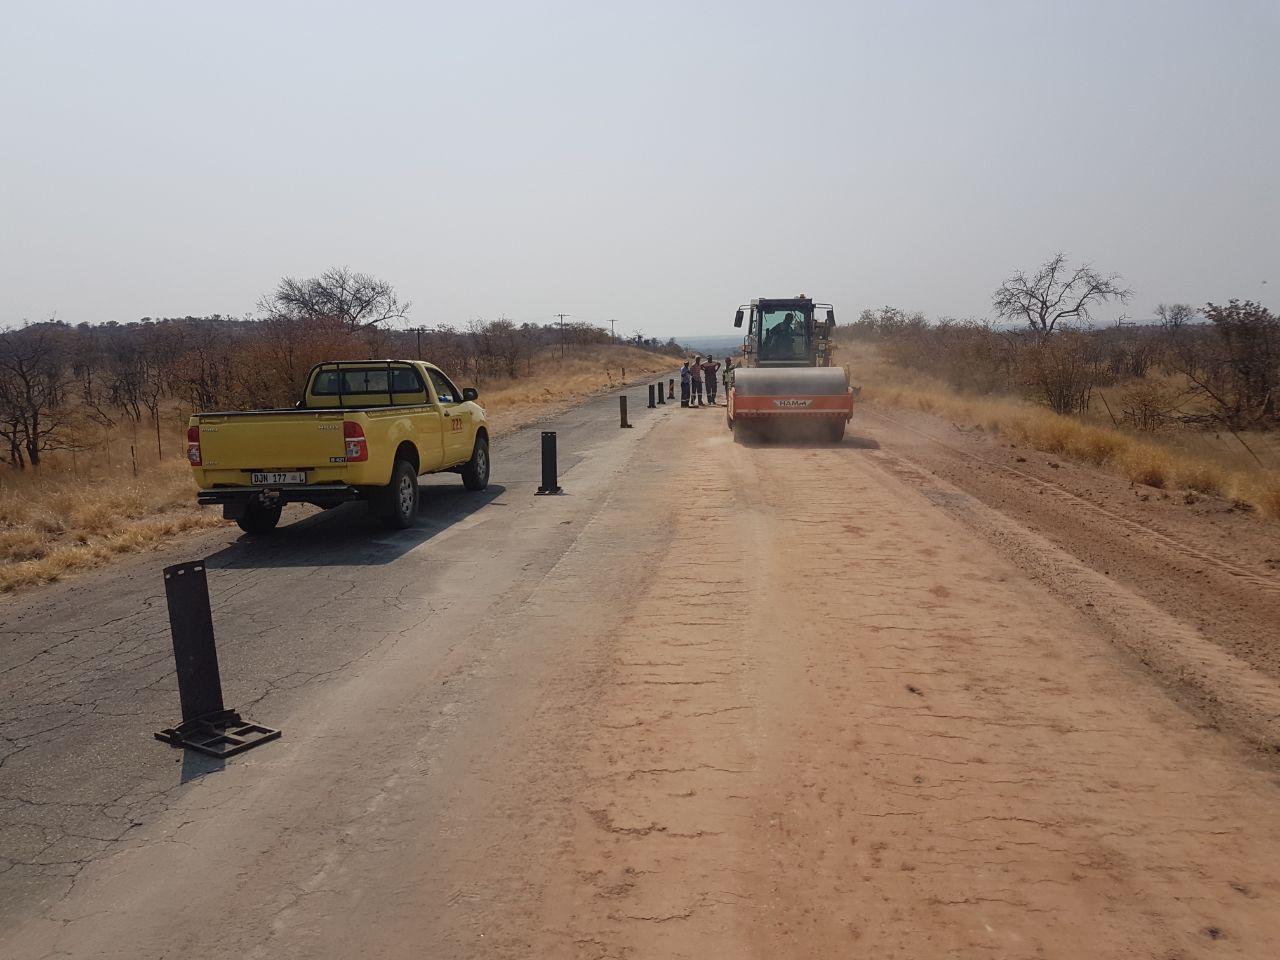 ZZ2 working on the roads